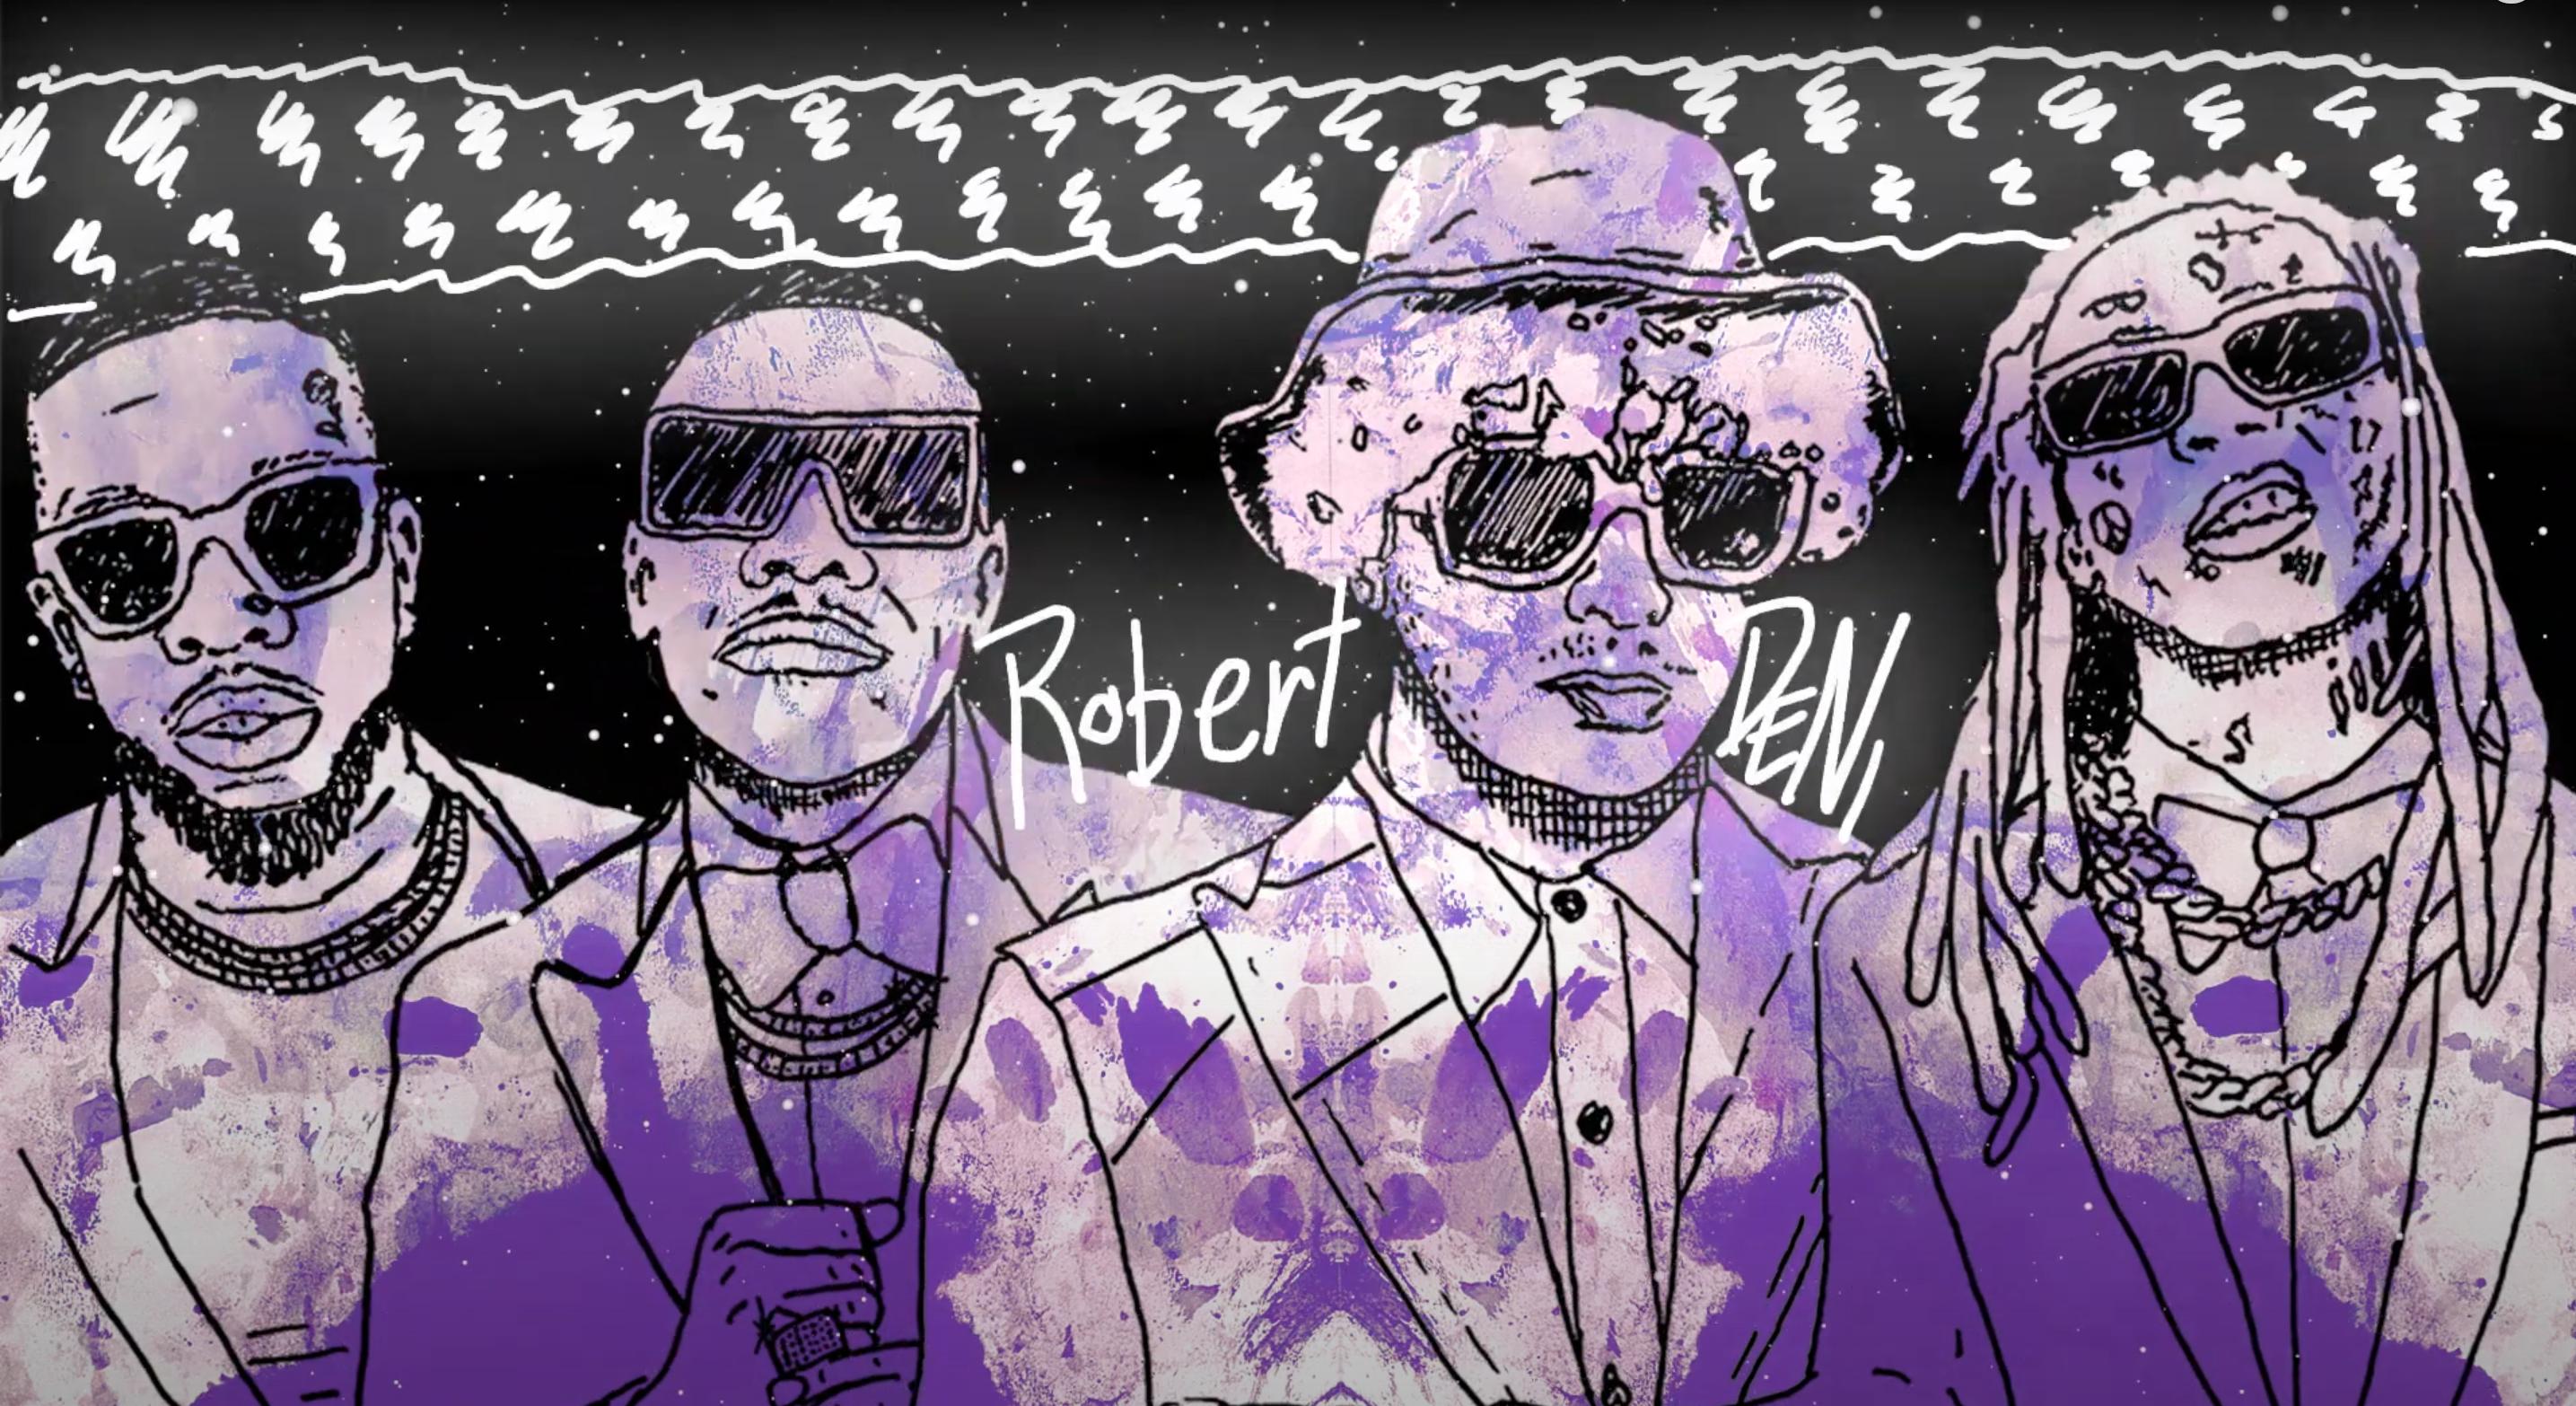 Whats poppin remix